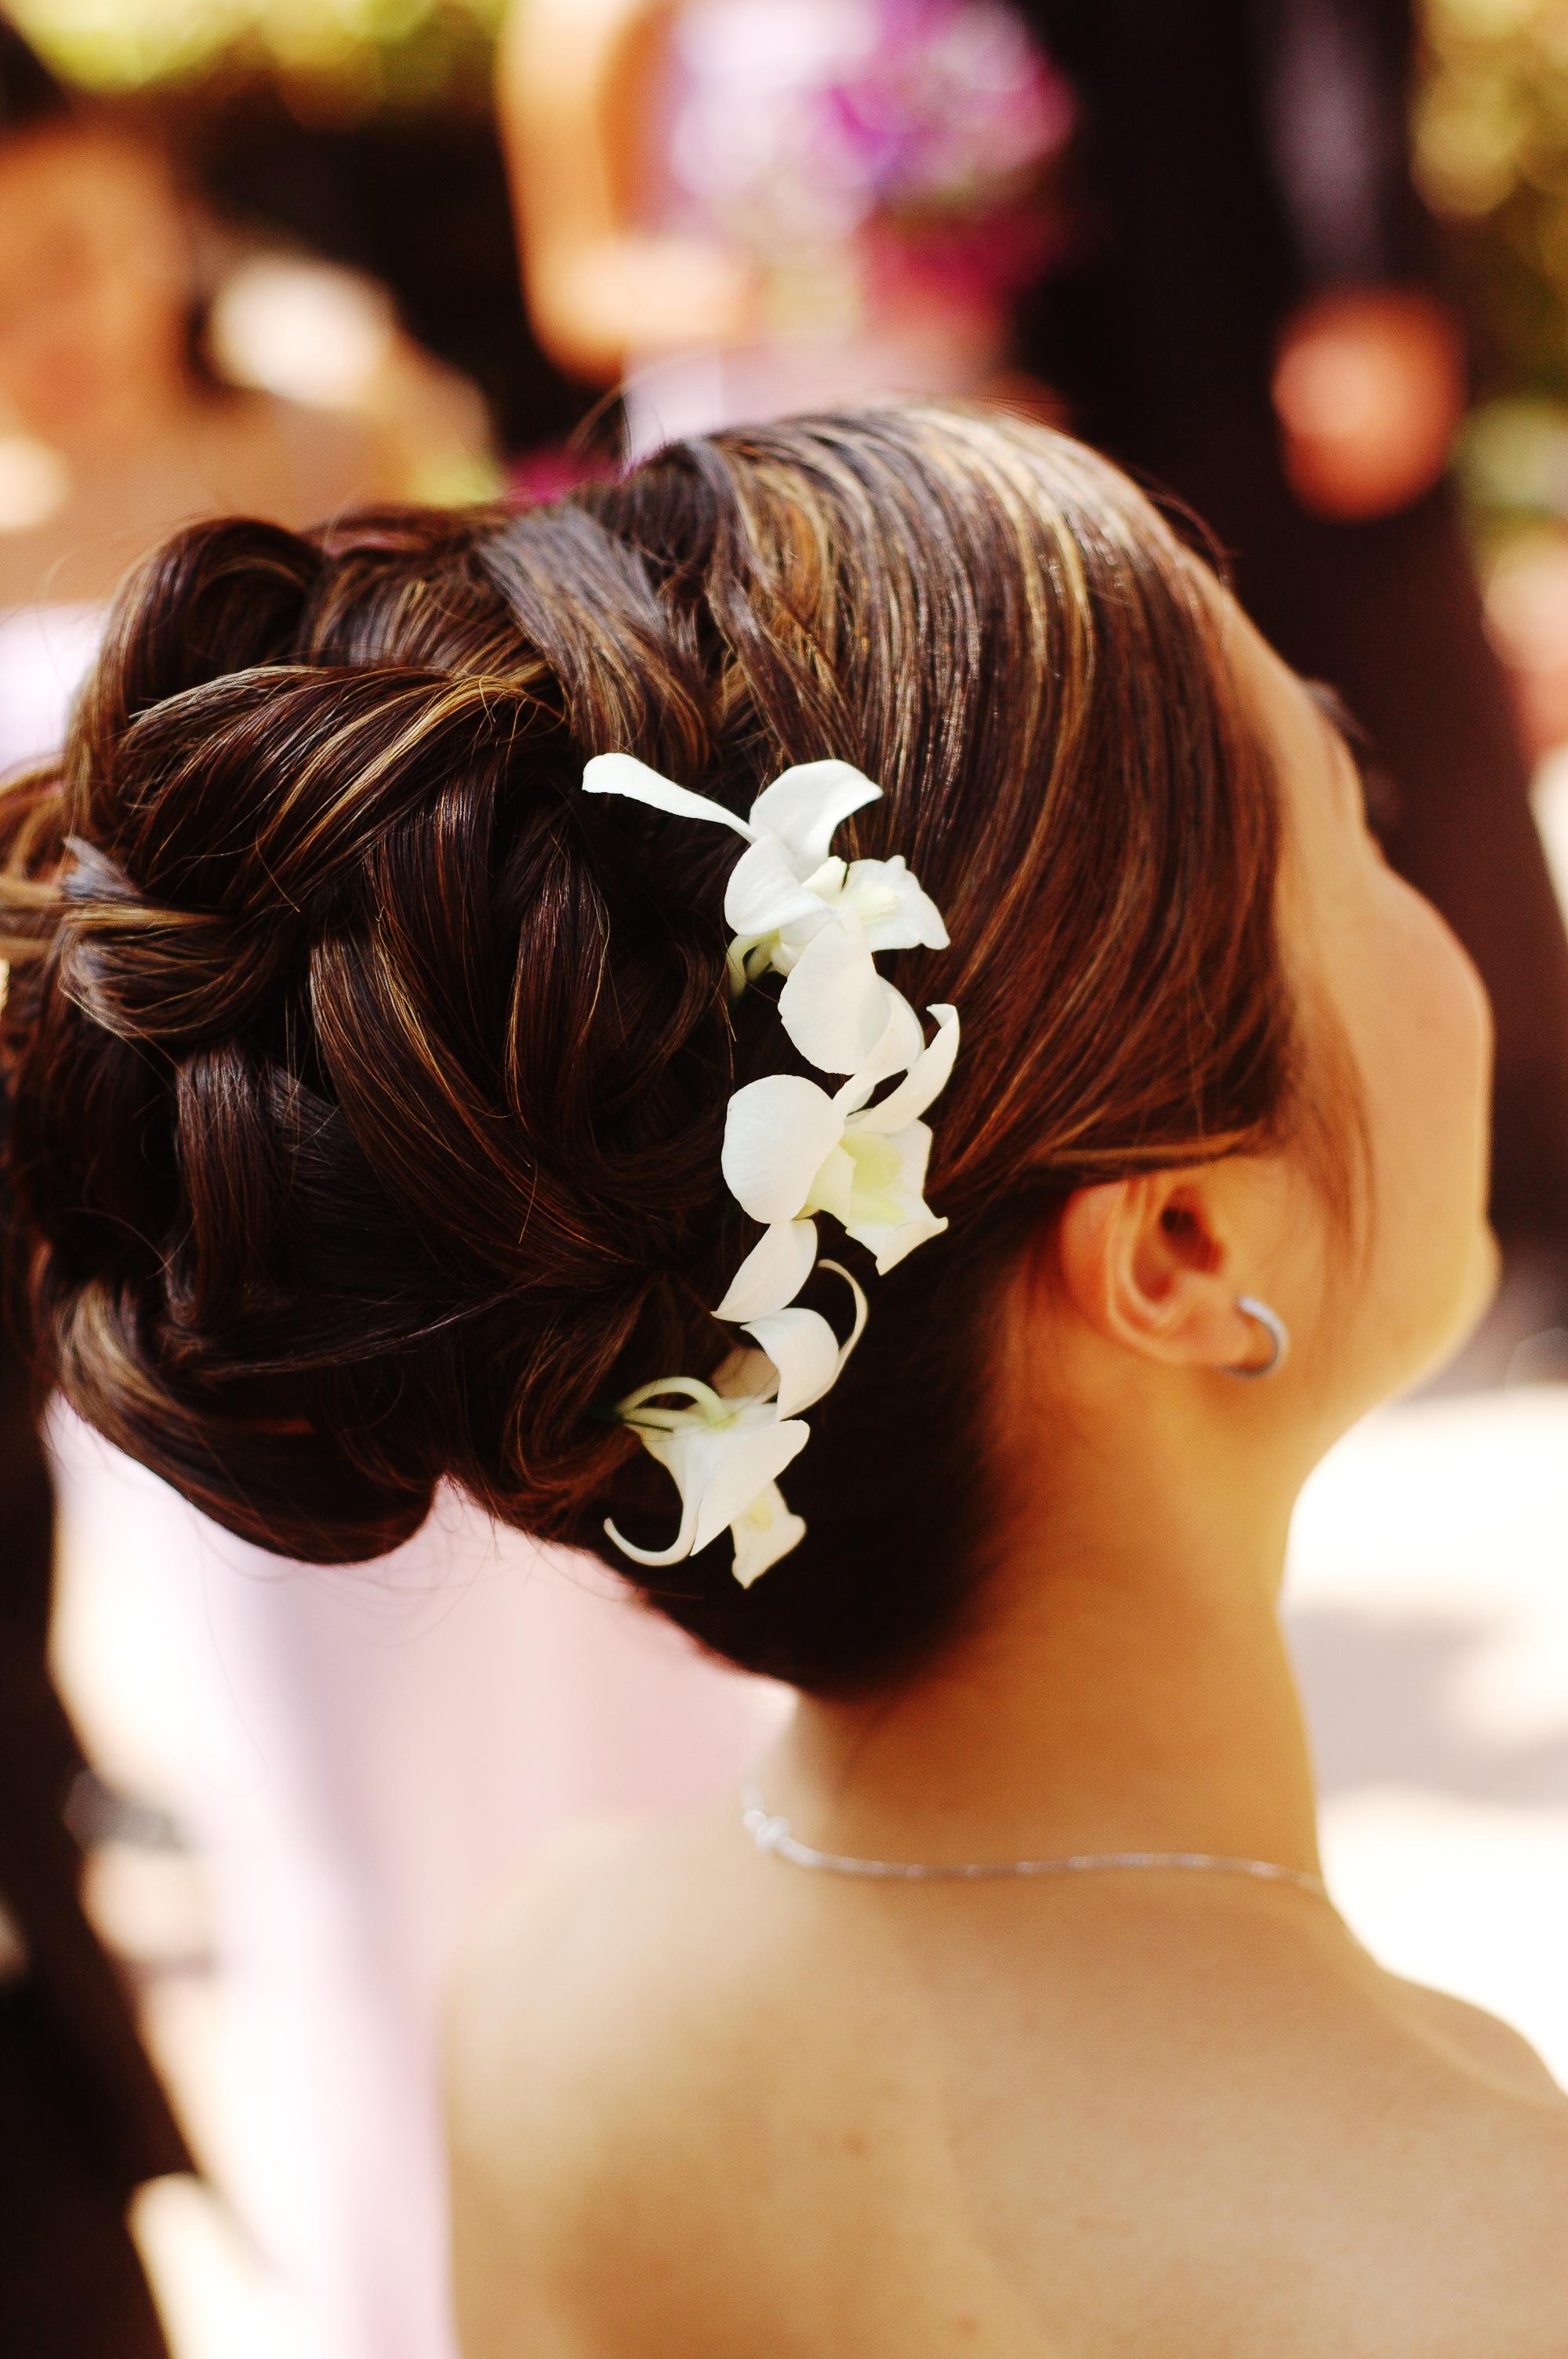 Beauty, Updo, Hair, Joyce luck style